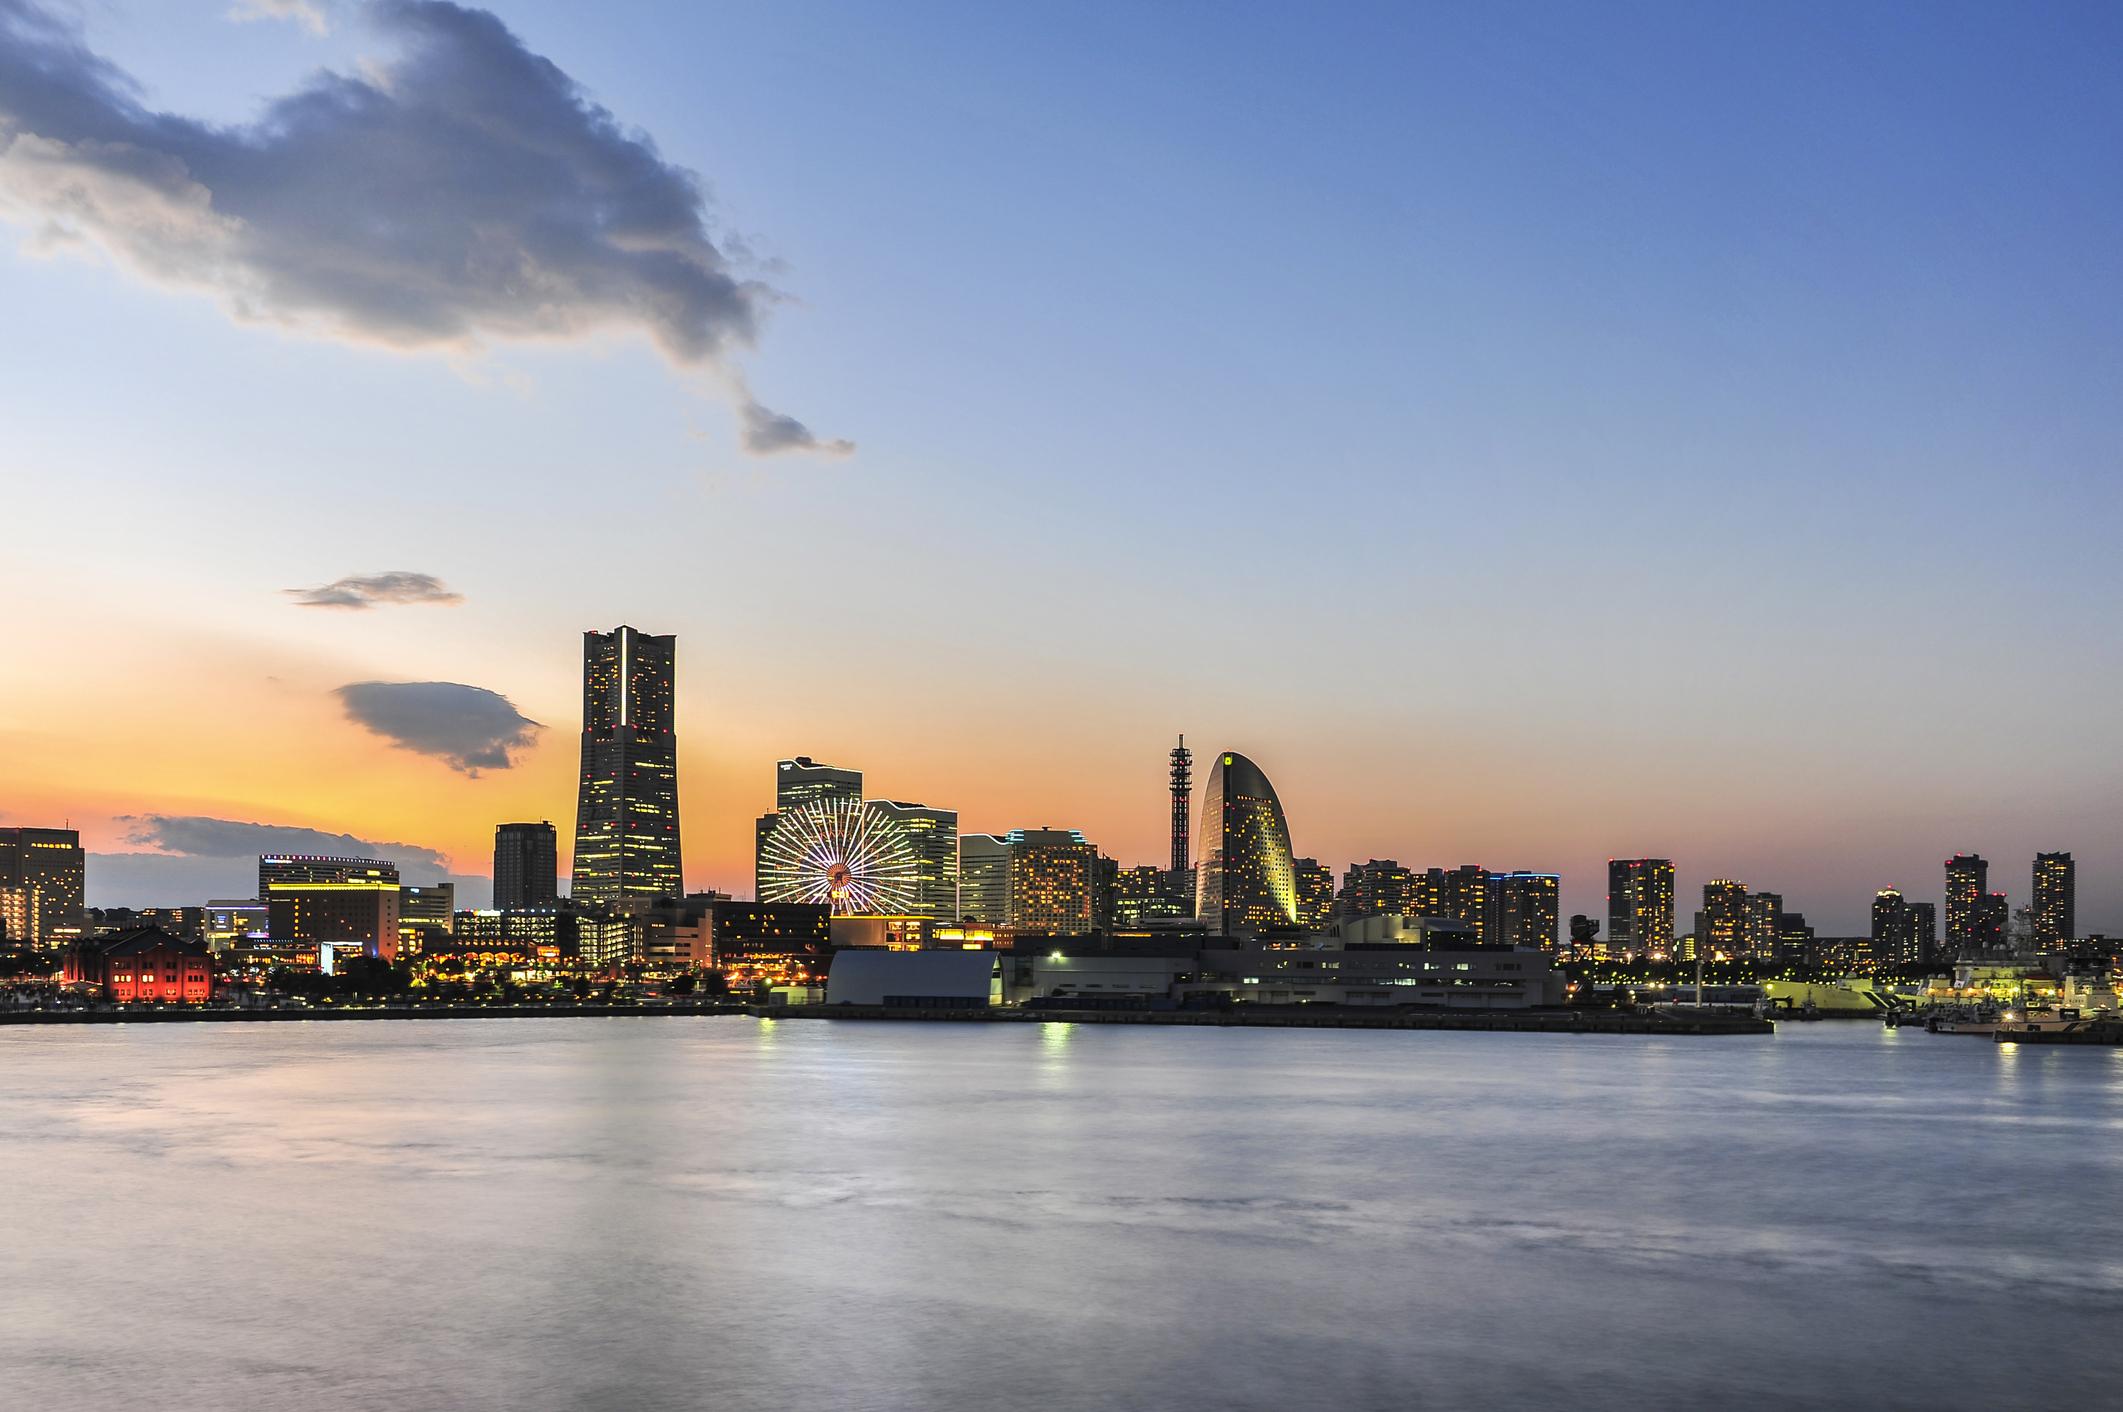 Yokohama-city-at-sunset-519492829_2125x1